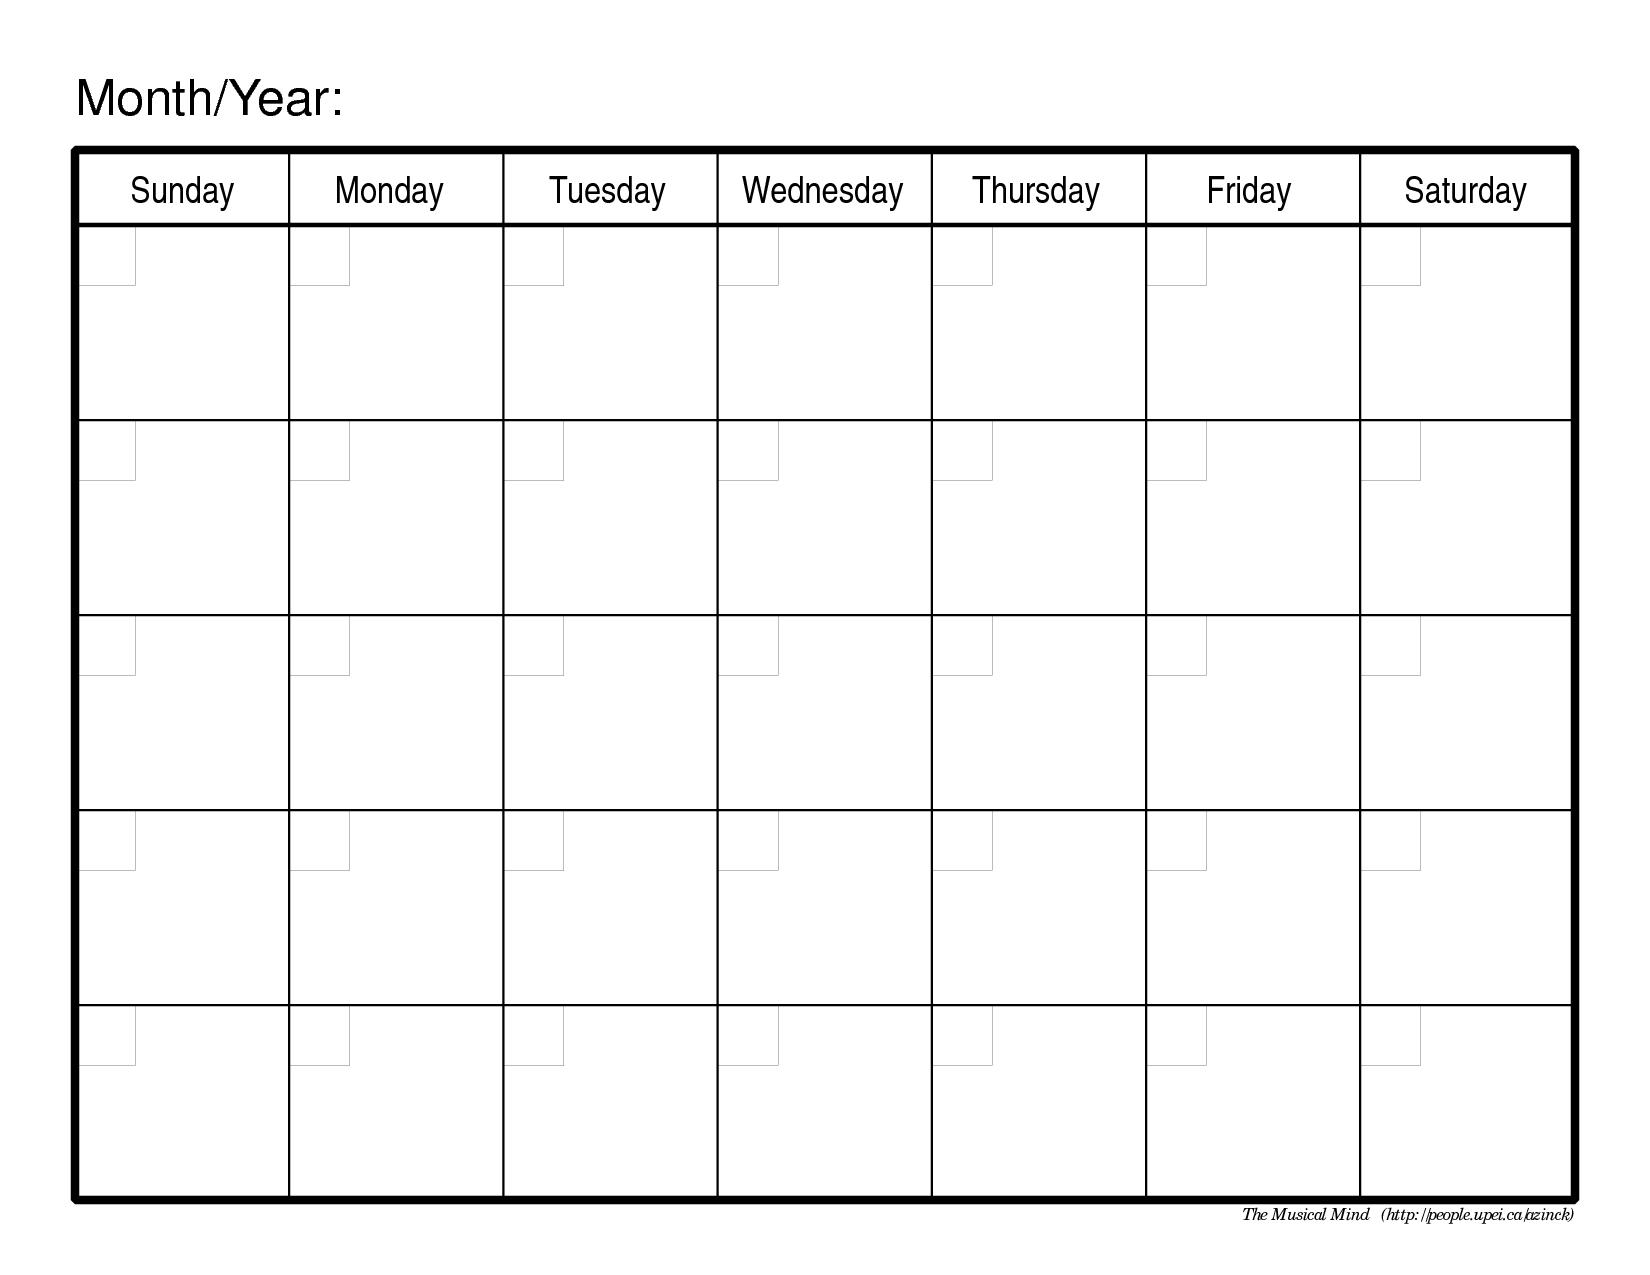 Generic Monthly Calendar Template Word - Infer.ifreezer.co regarding Calendar Printable Monthly Templates